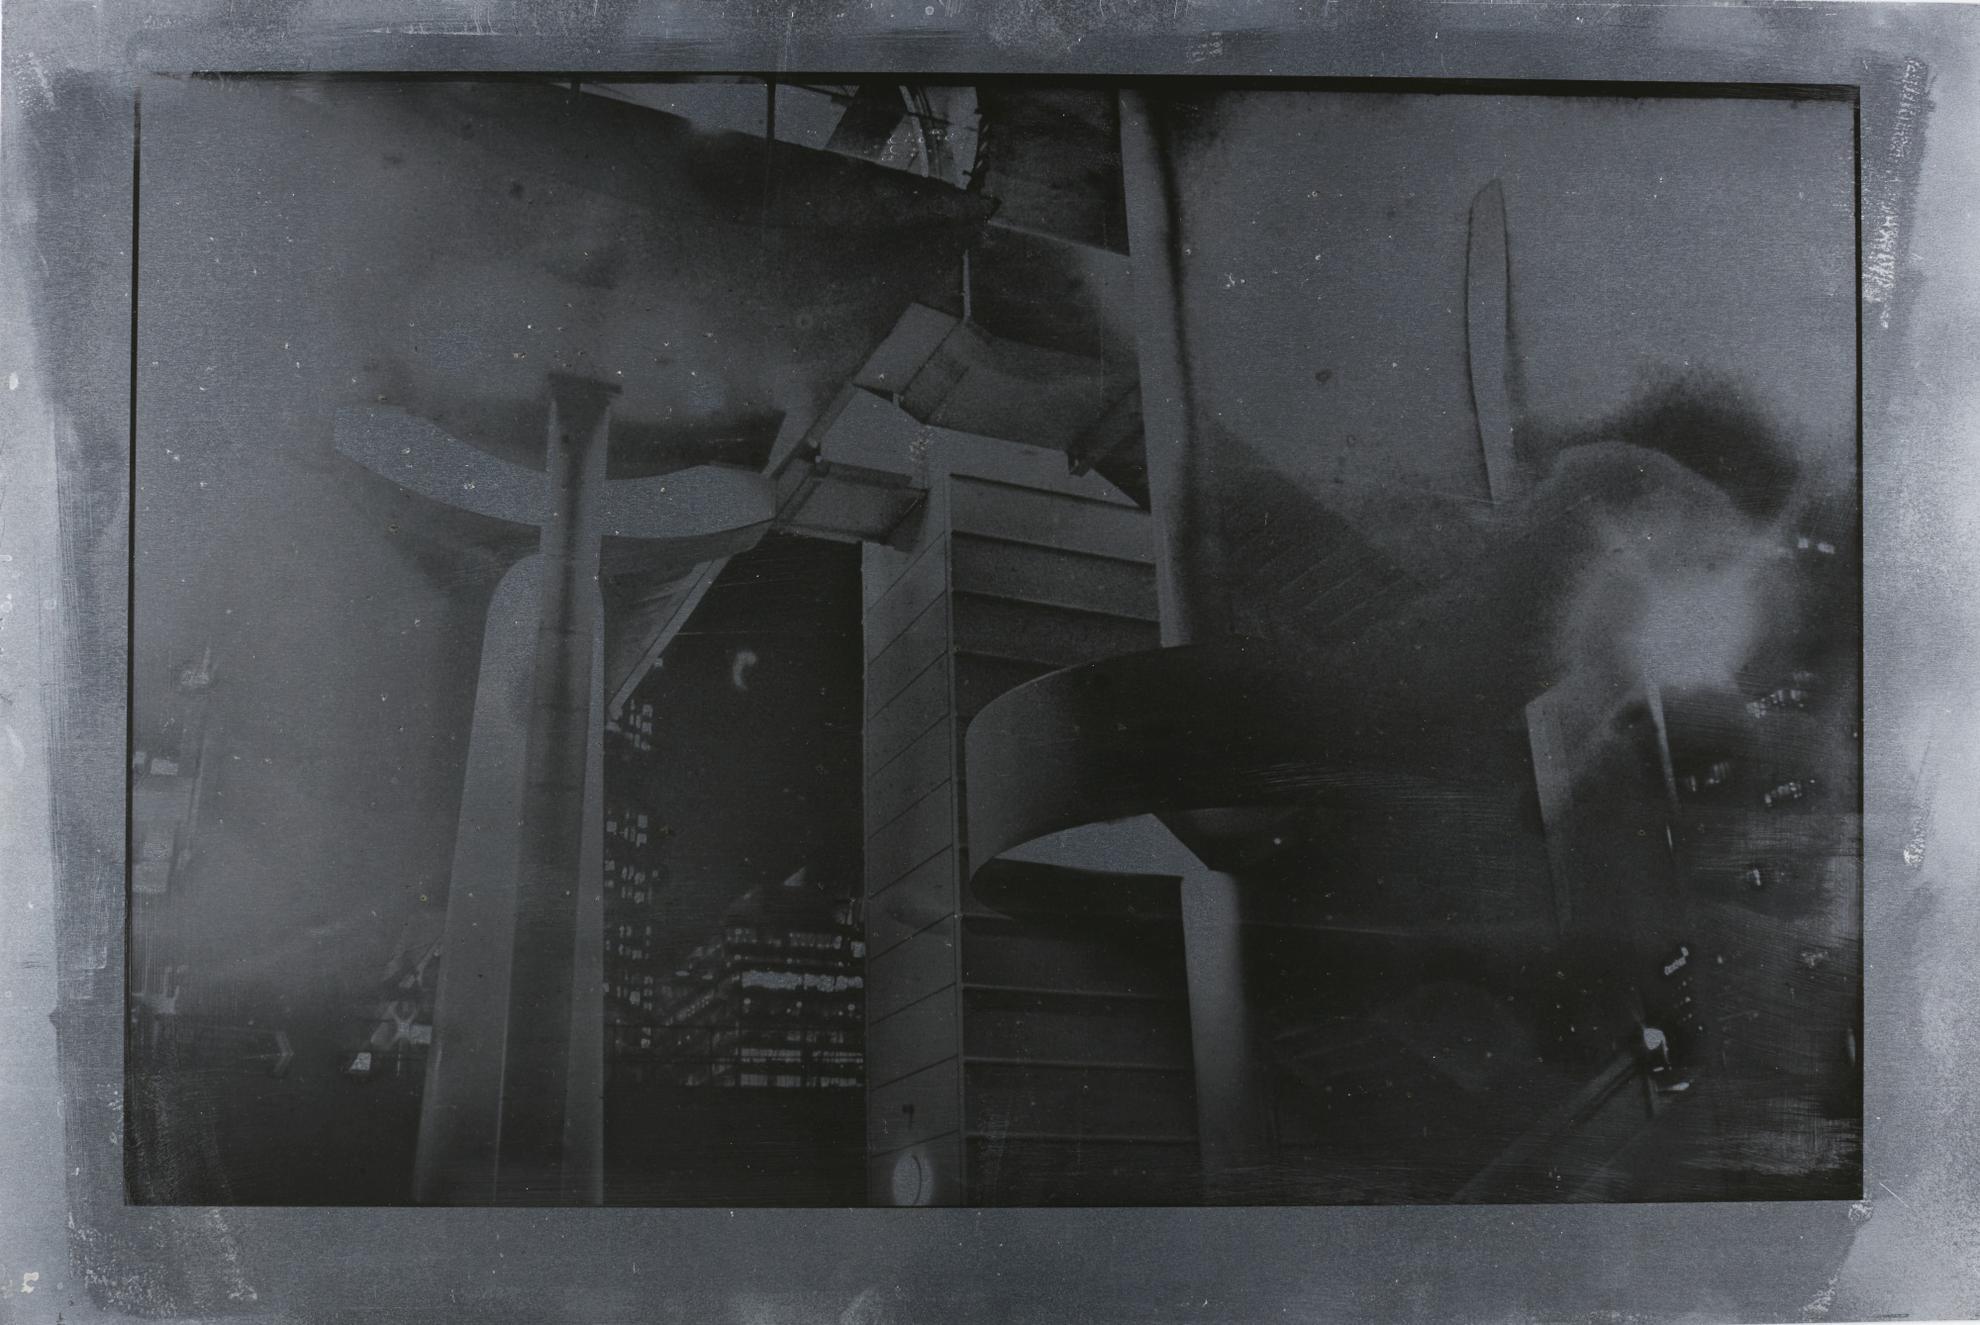 Antony Cairns - Ldn023-2012